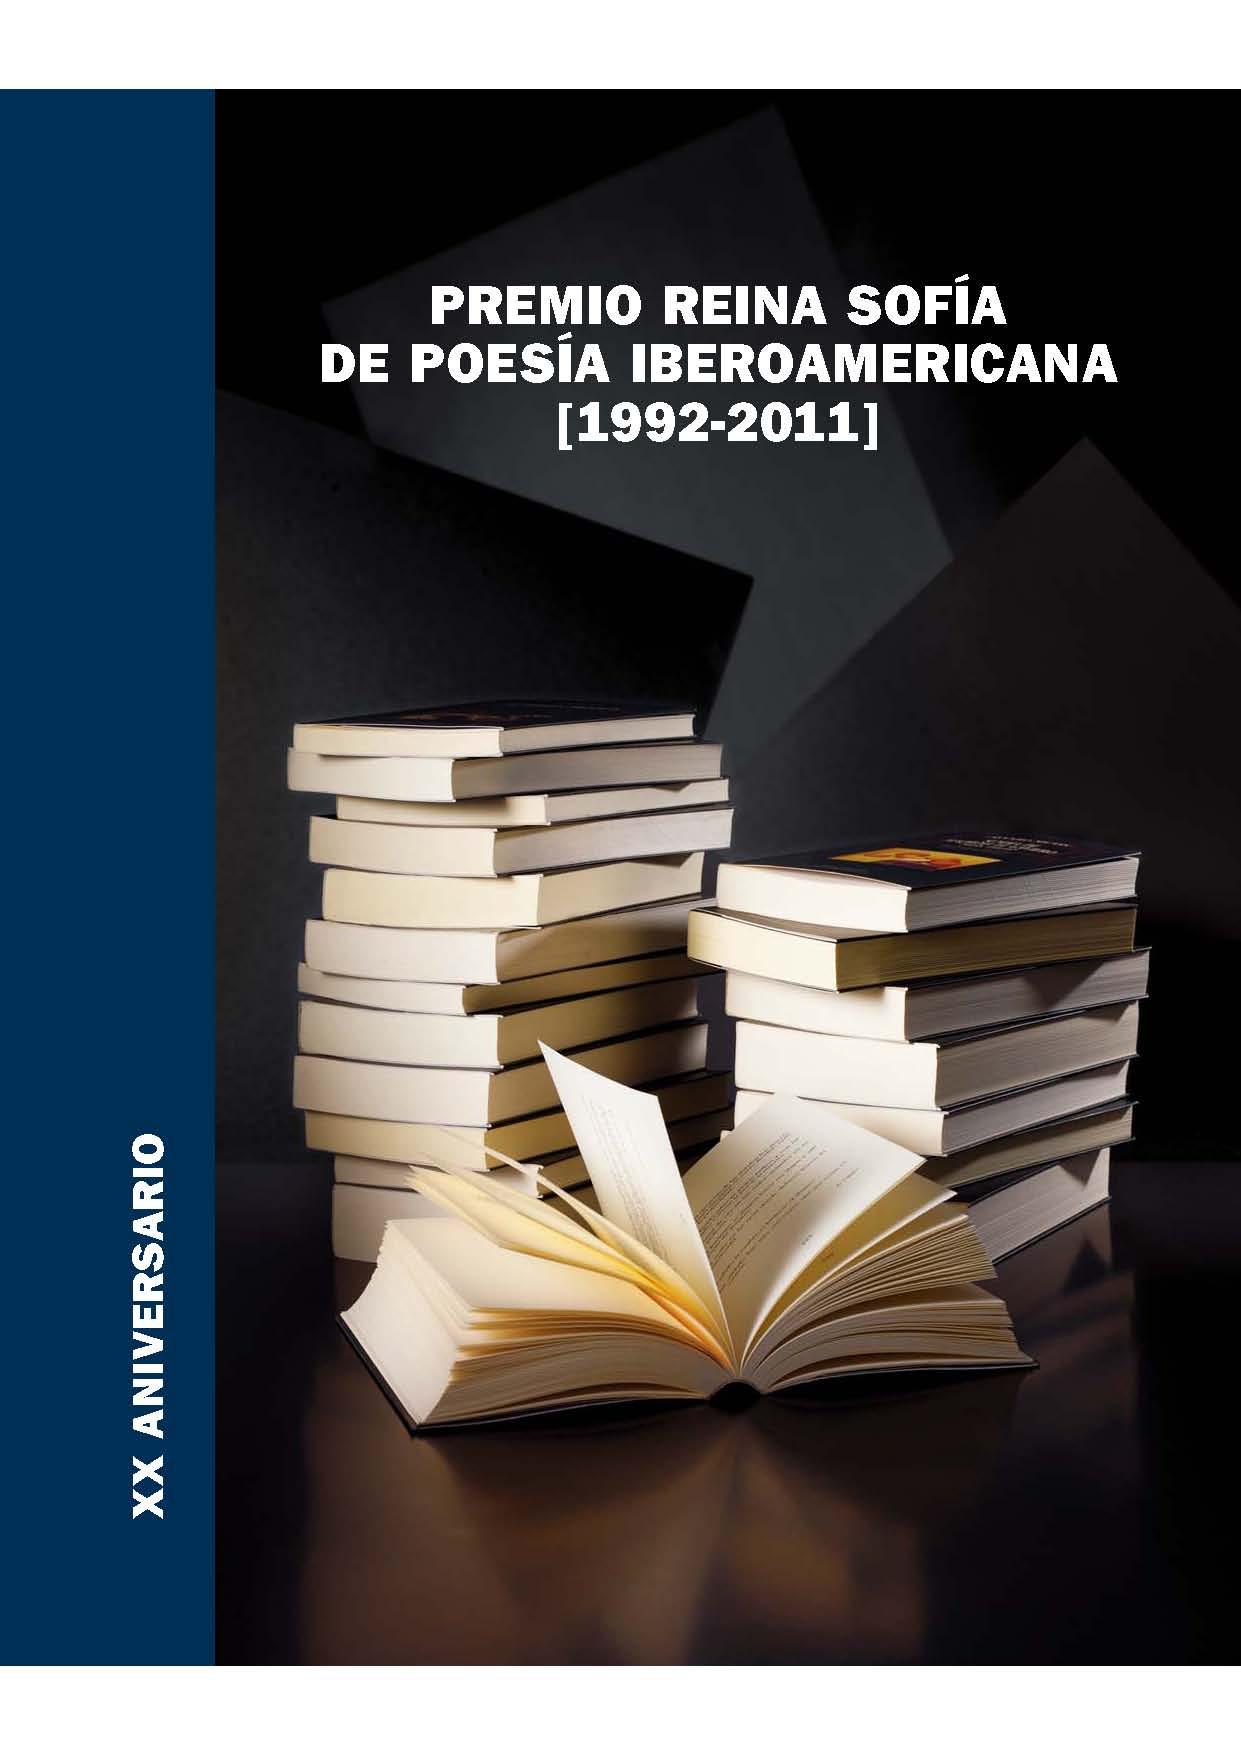 Premio Reina Sofía de Poesía Iberoamericana